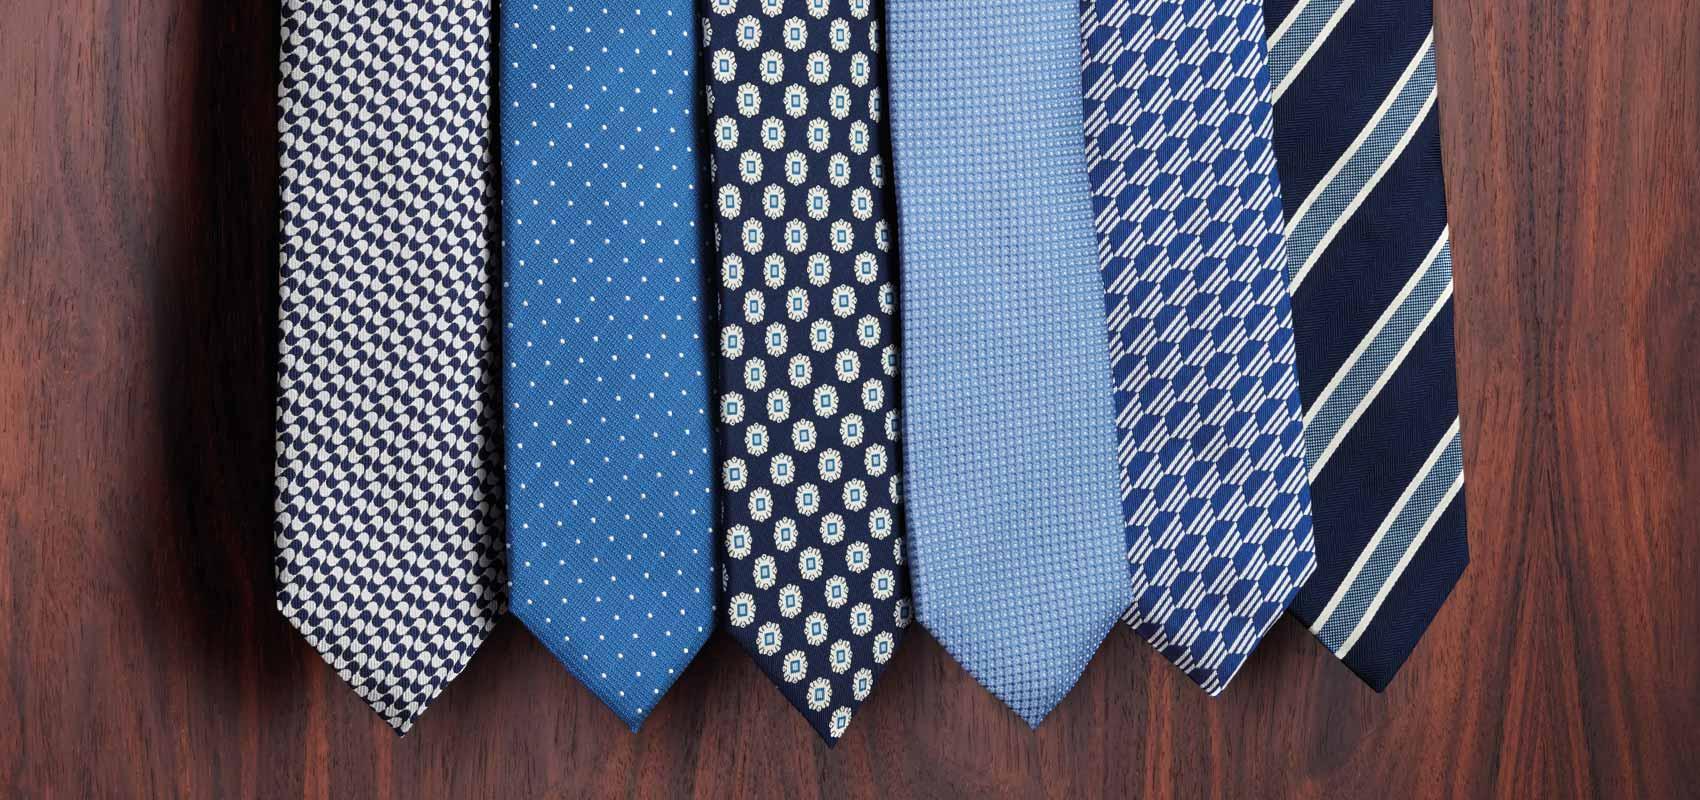 Charles Tyrwhitt Klassische Krawatten